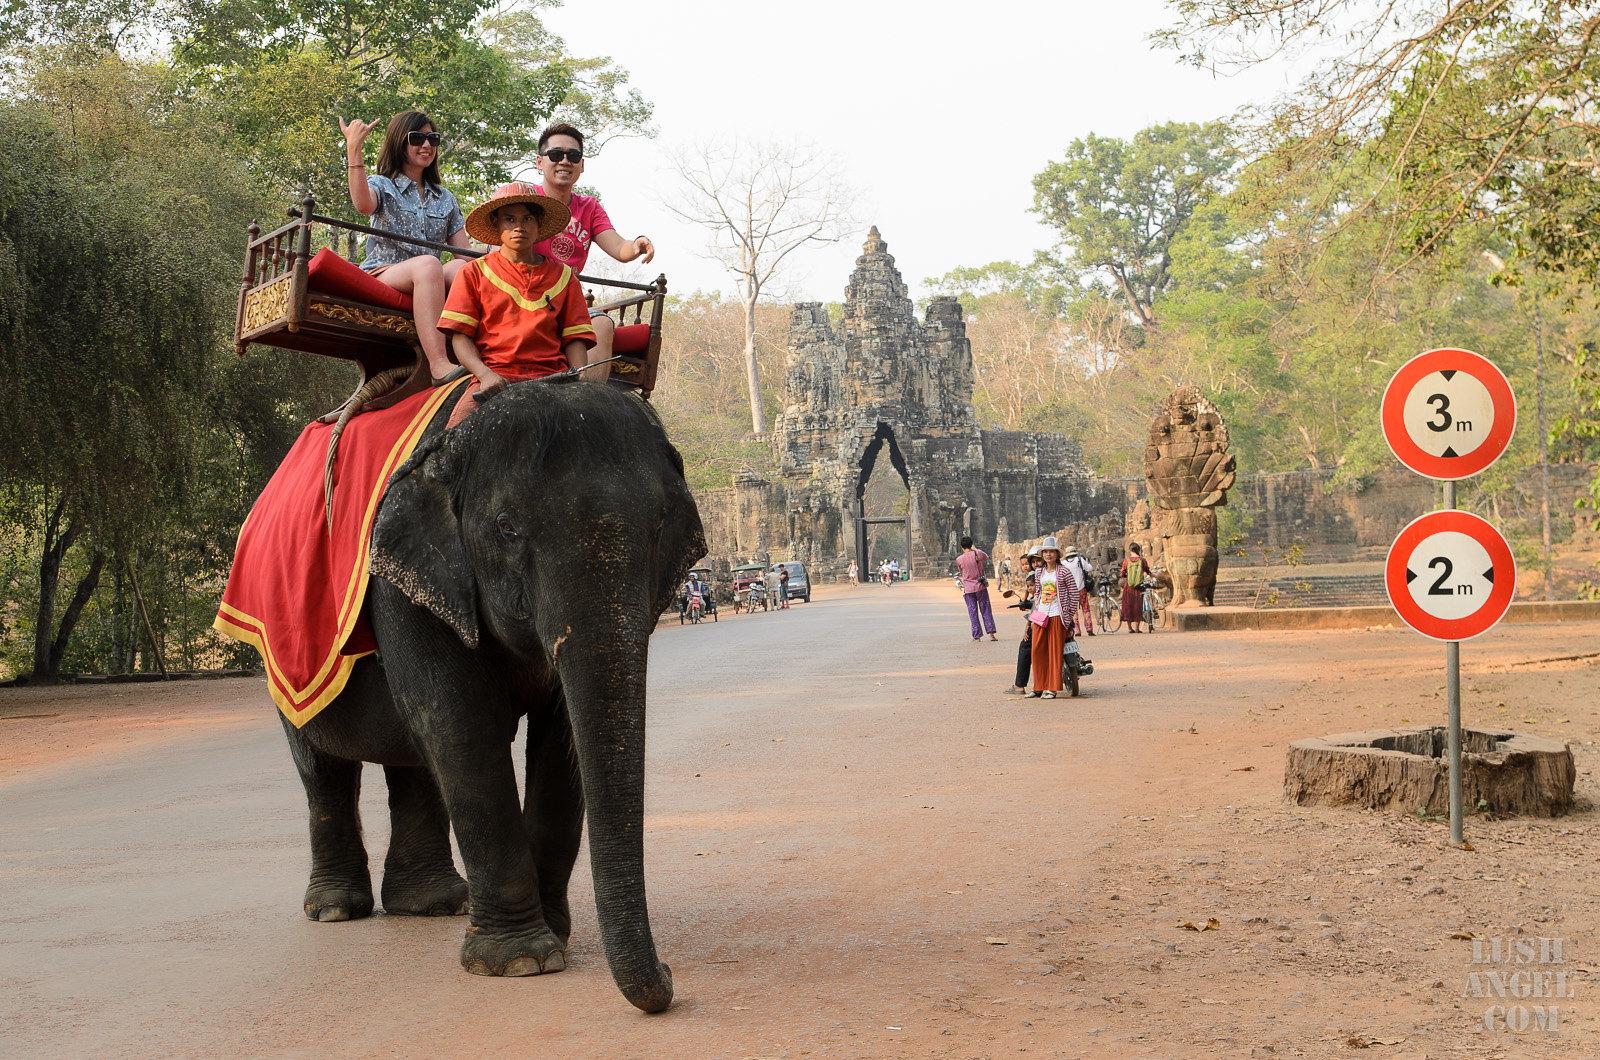 cambodia-siem-reap-elephant-ride